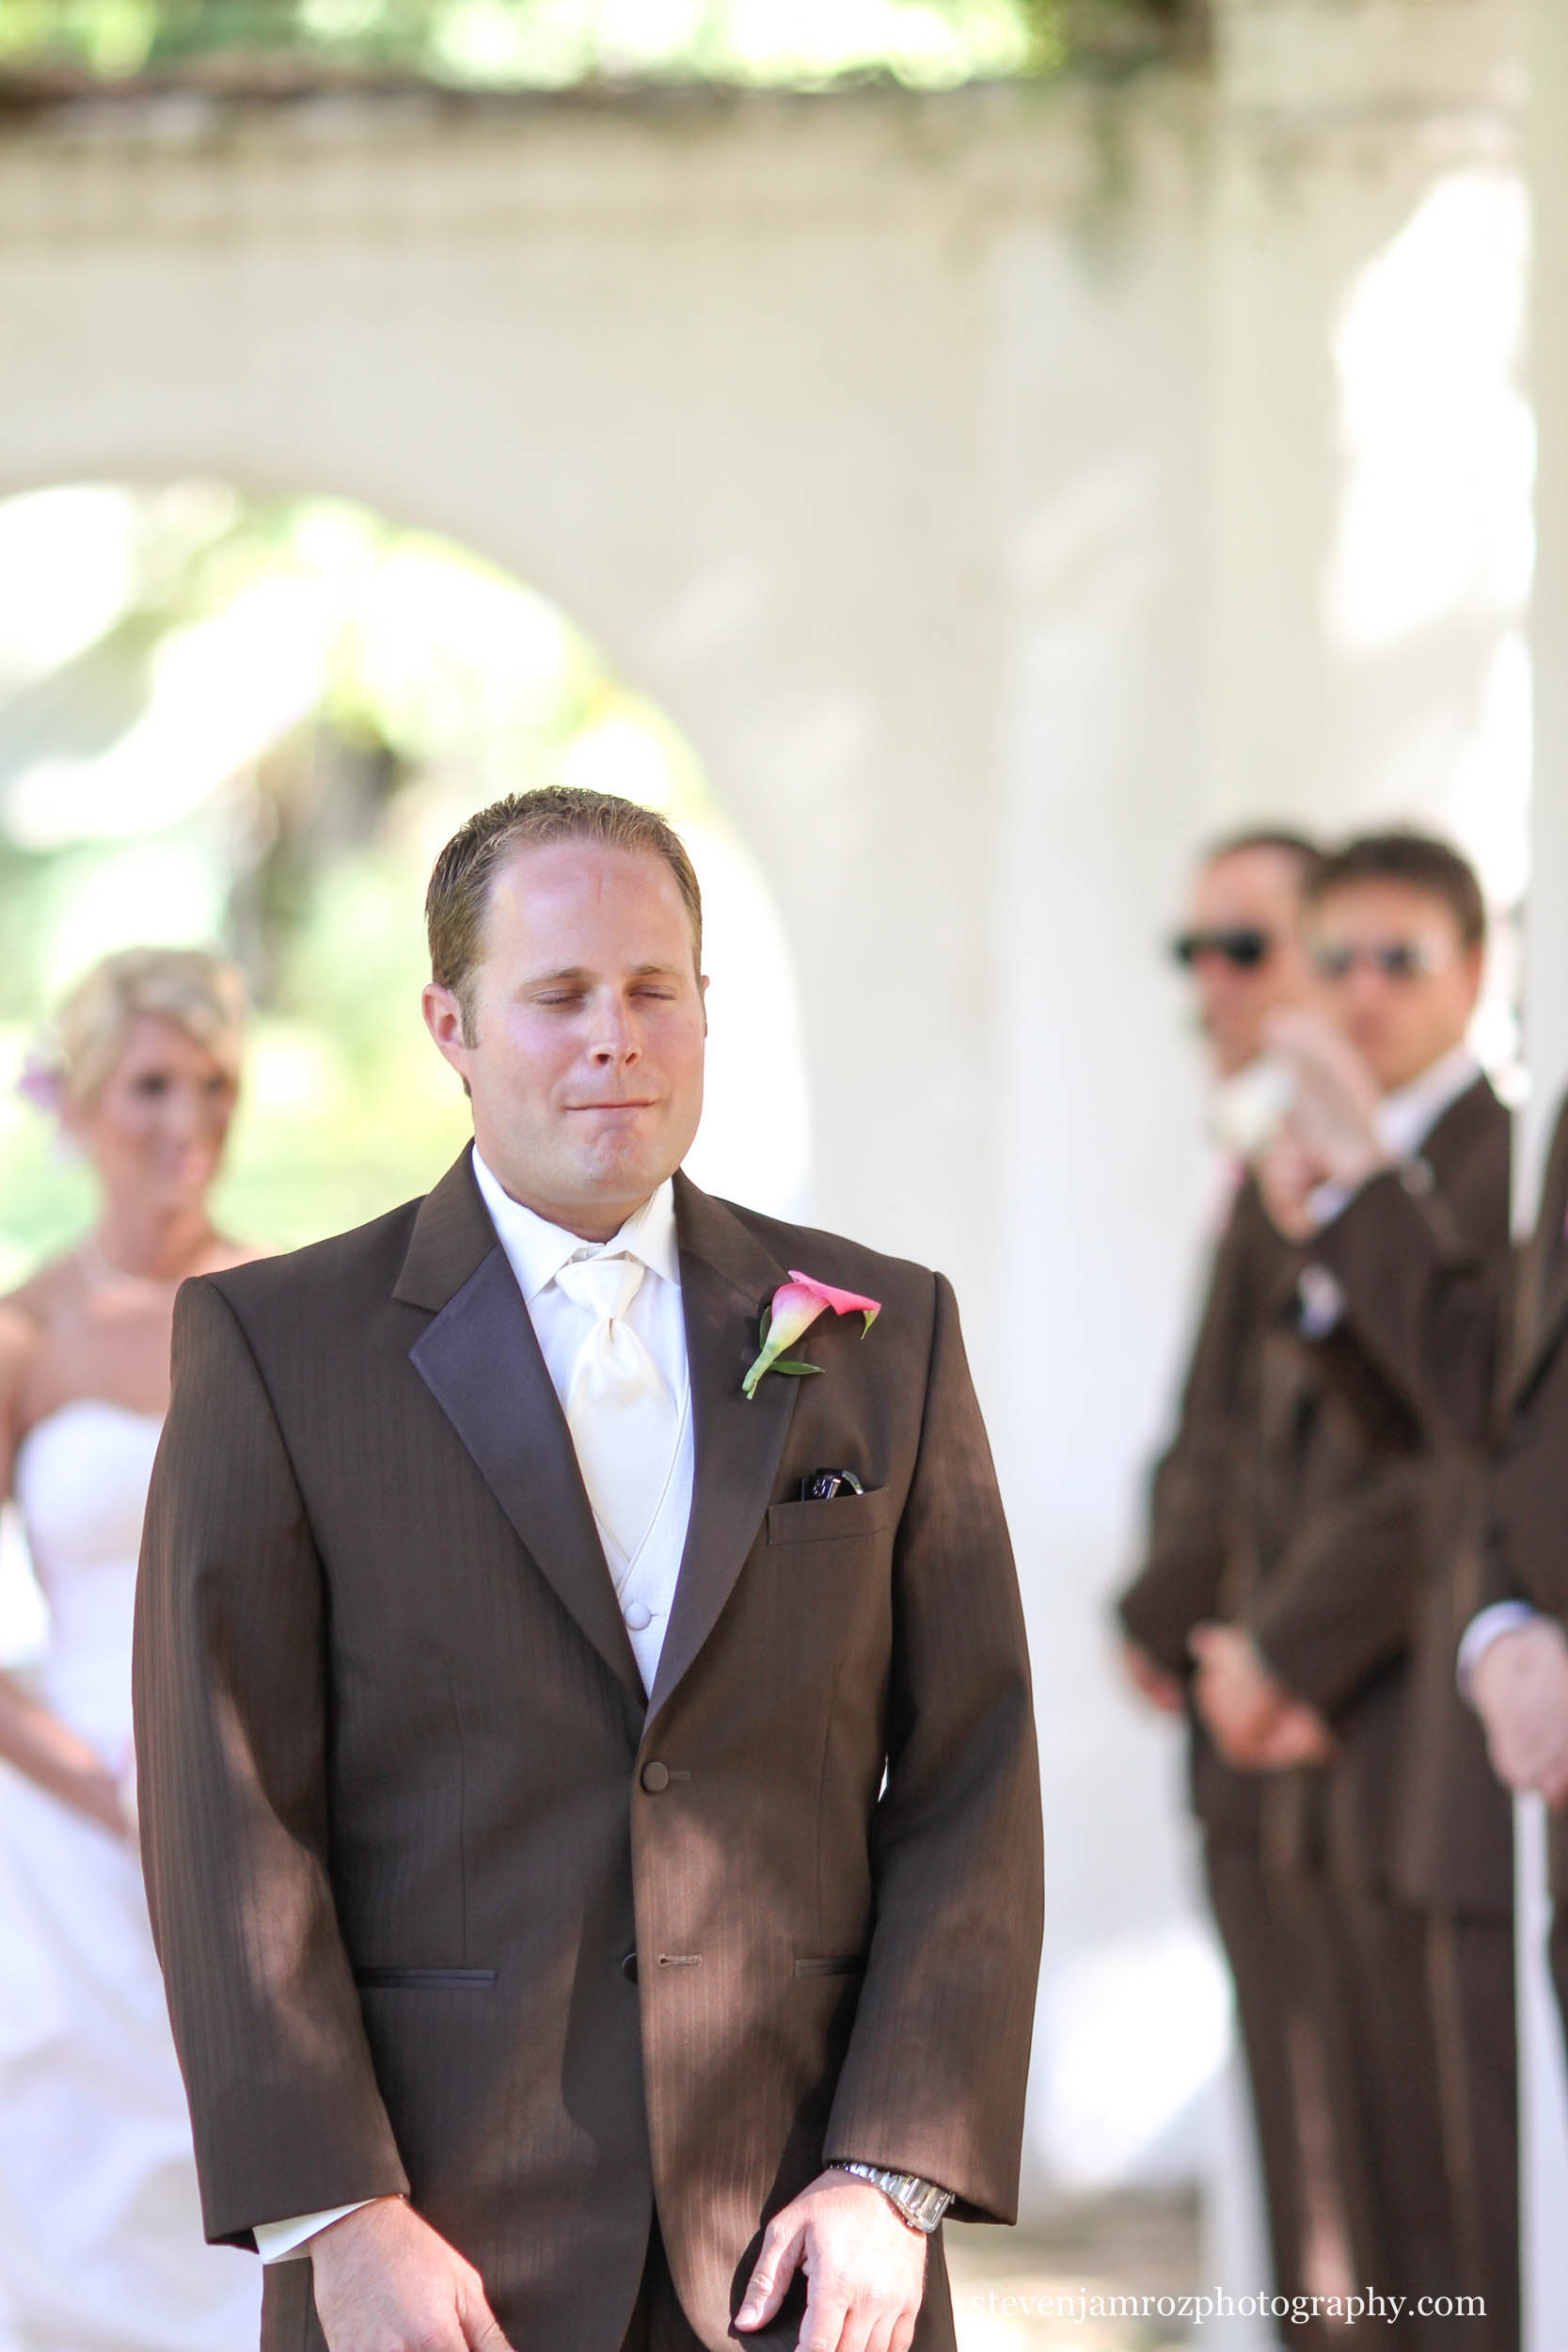 anticipation-groom-first-look-wedding-durham-steven-jamroz-photography-0068.jpg